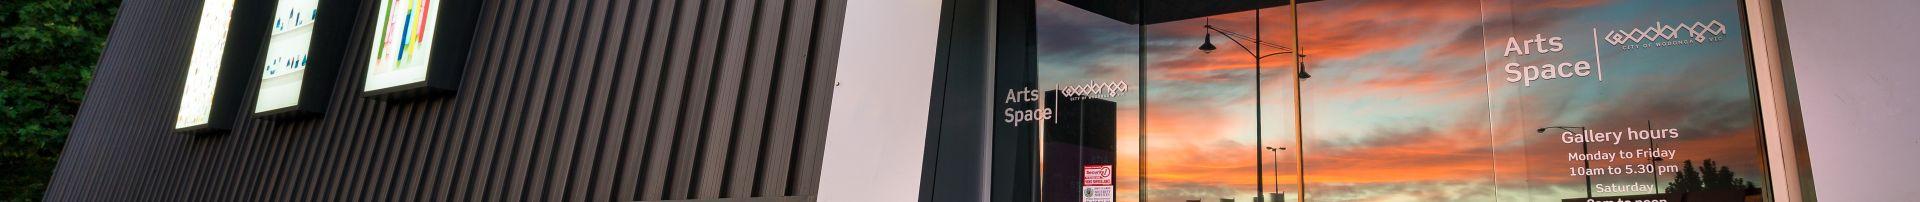 GALLERY Art Space Wodonga ArtSpaceLightBox3x2